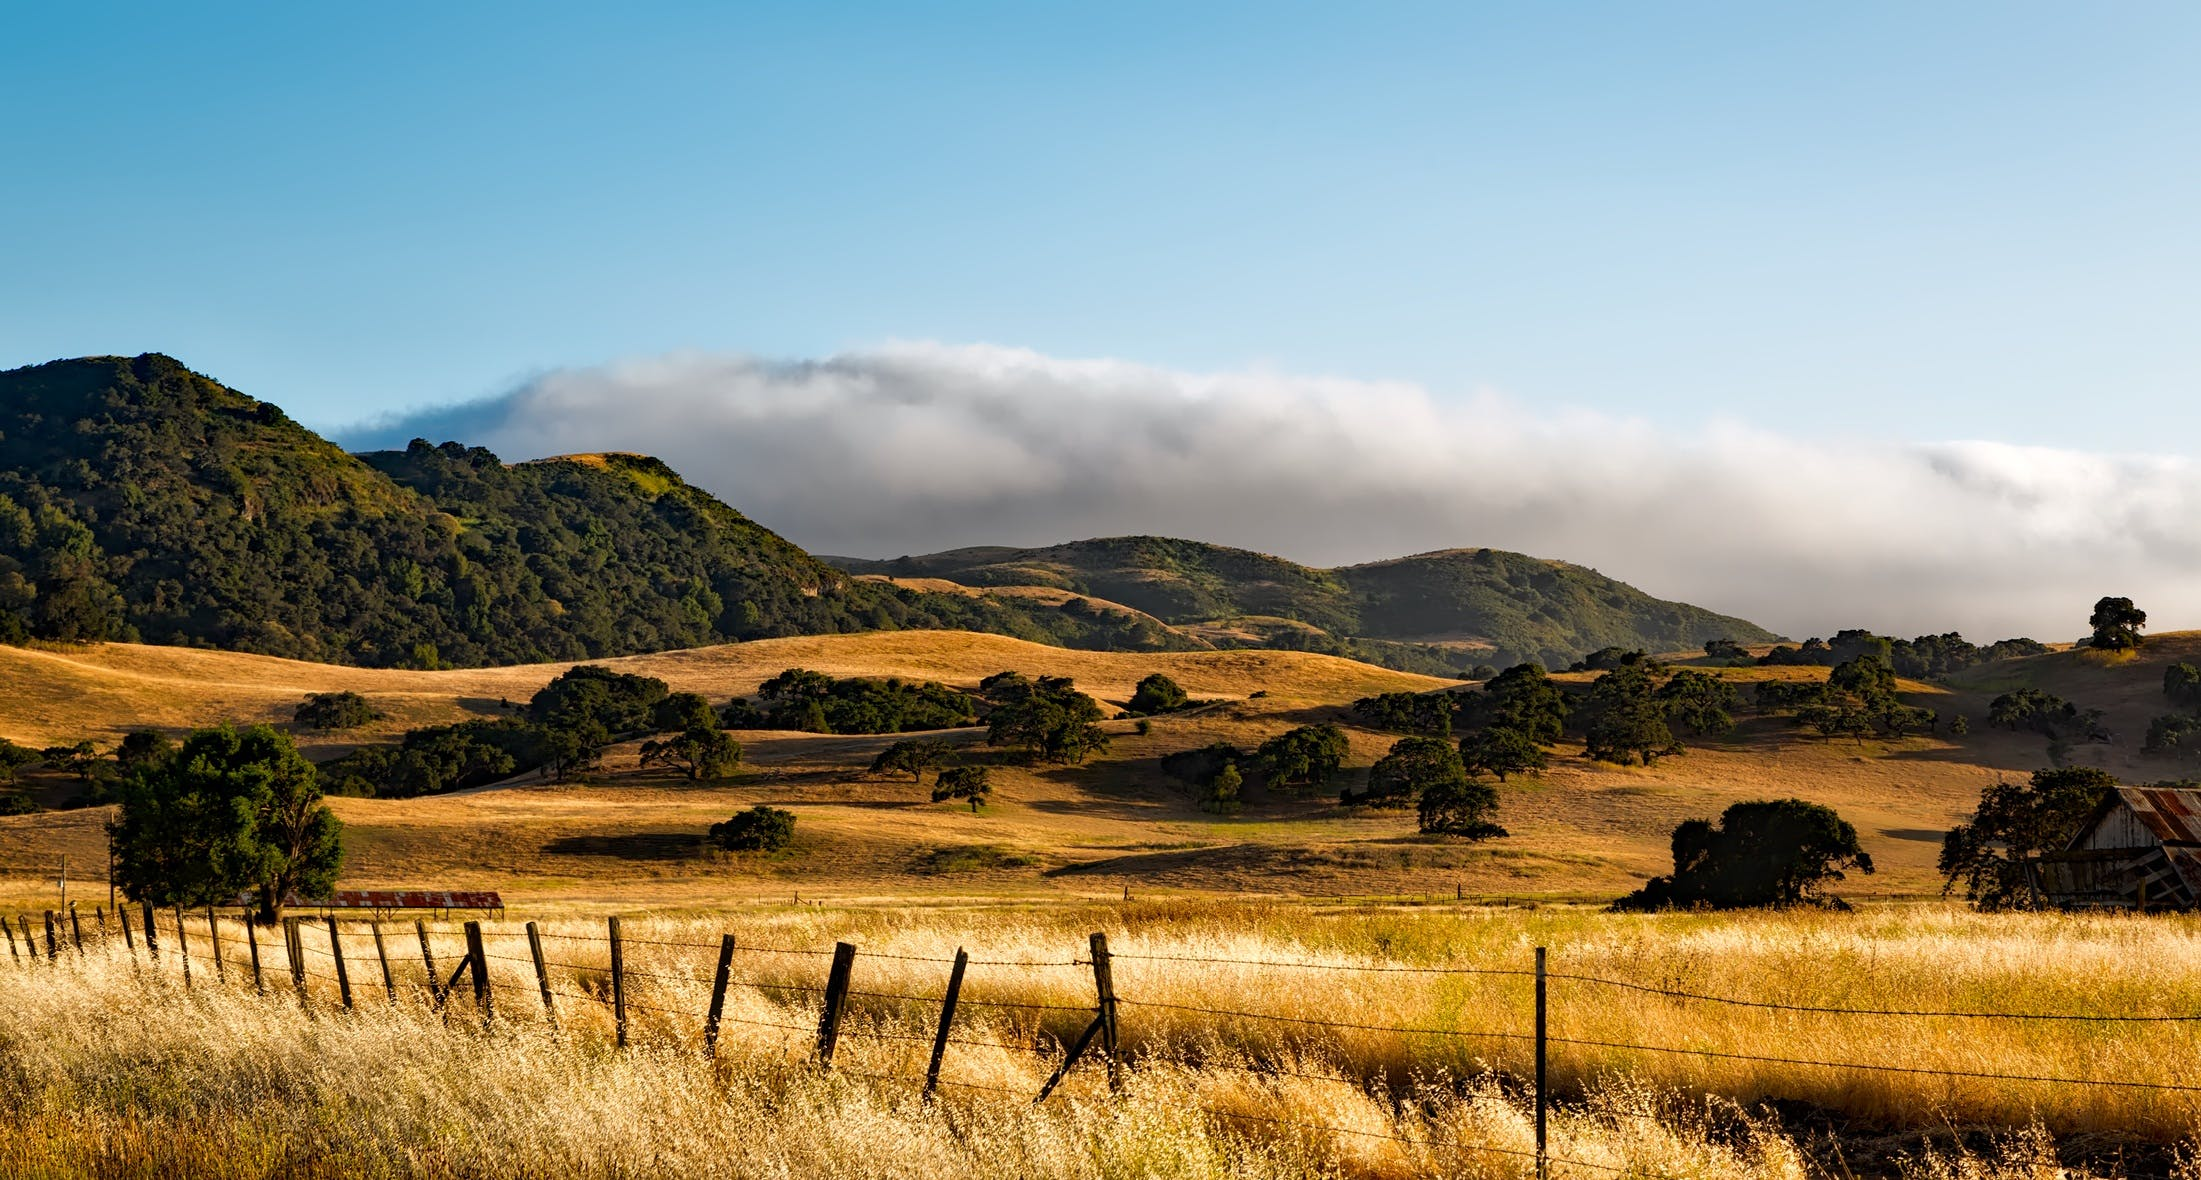 Kostenloses Stock Foto zu landschaft, berge, wolken, feld